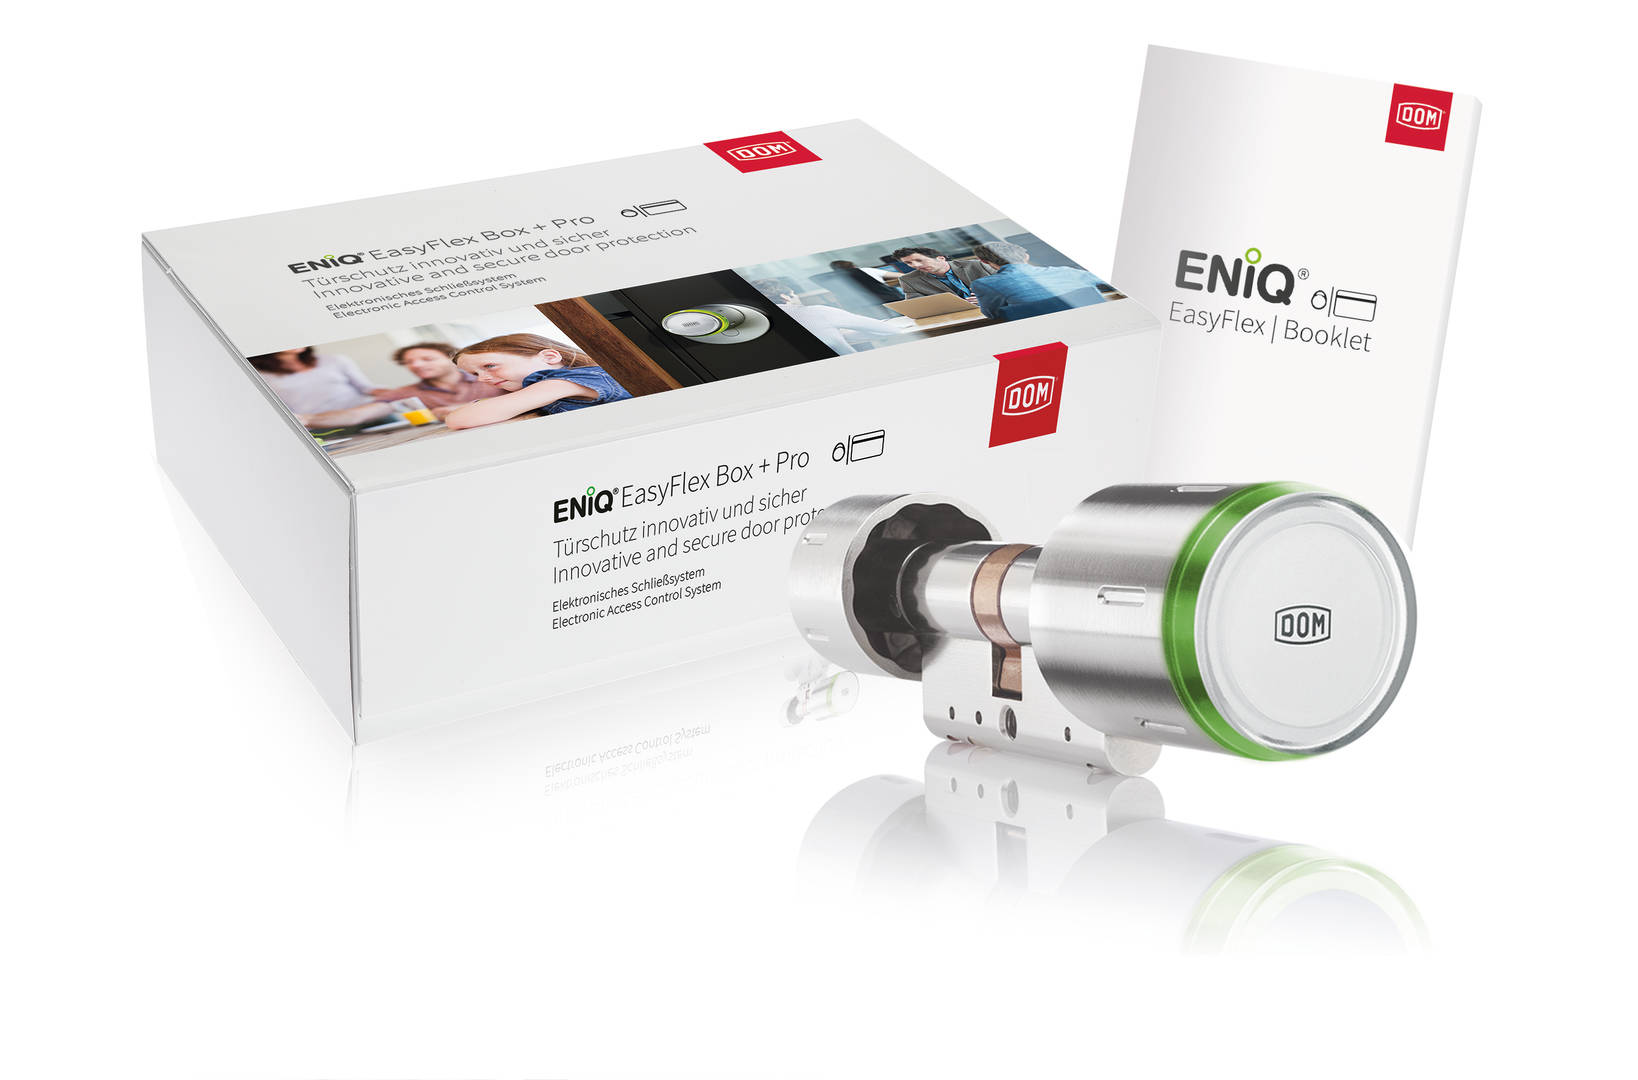 DOM ENiQ EasyFlex Box + Pro